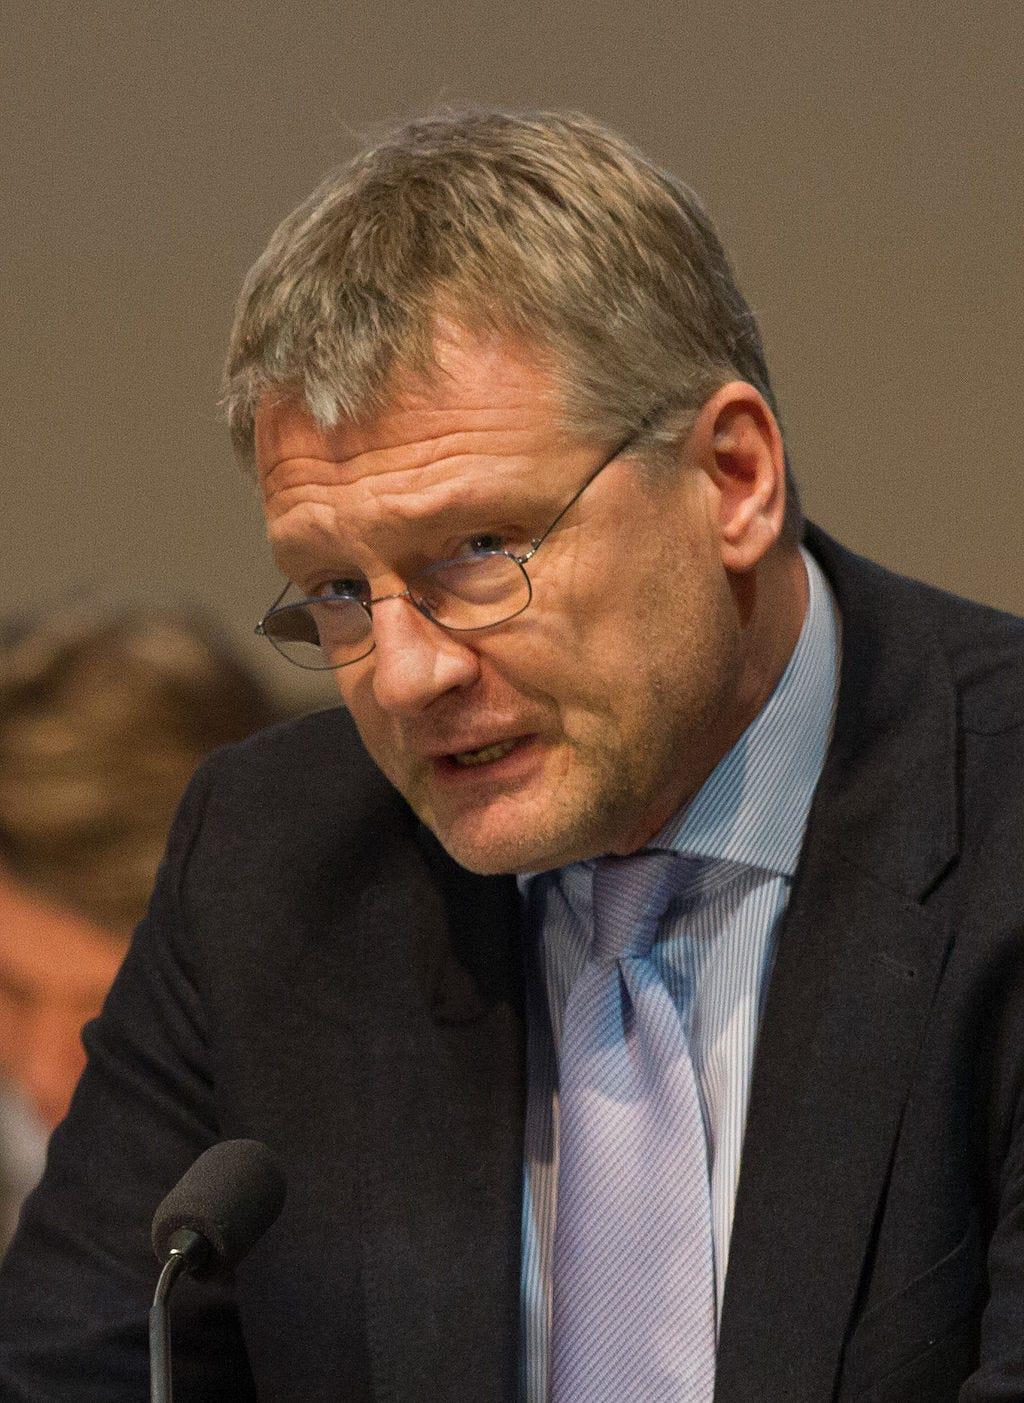 Jörg Meuthen, Head of the Afd - bigger than you think? ©Robin Krahl